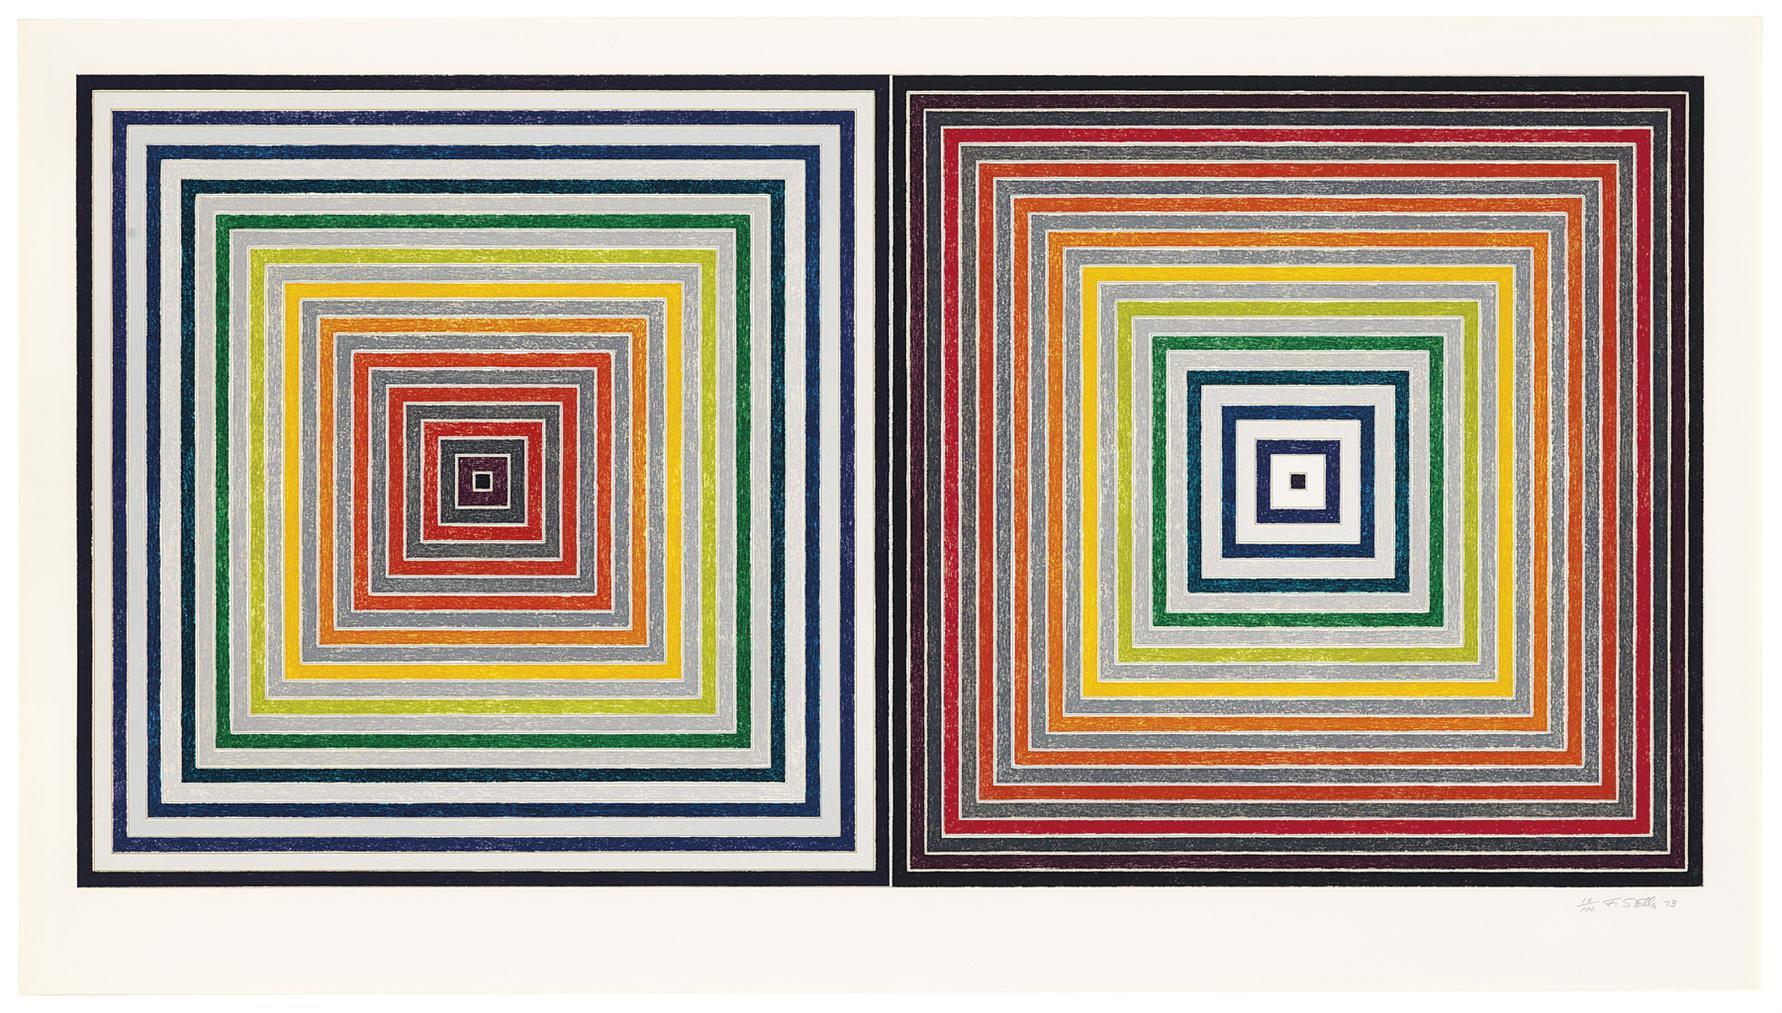 Frank Stella-Double Gray Scramble-1973